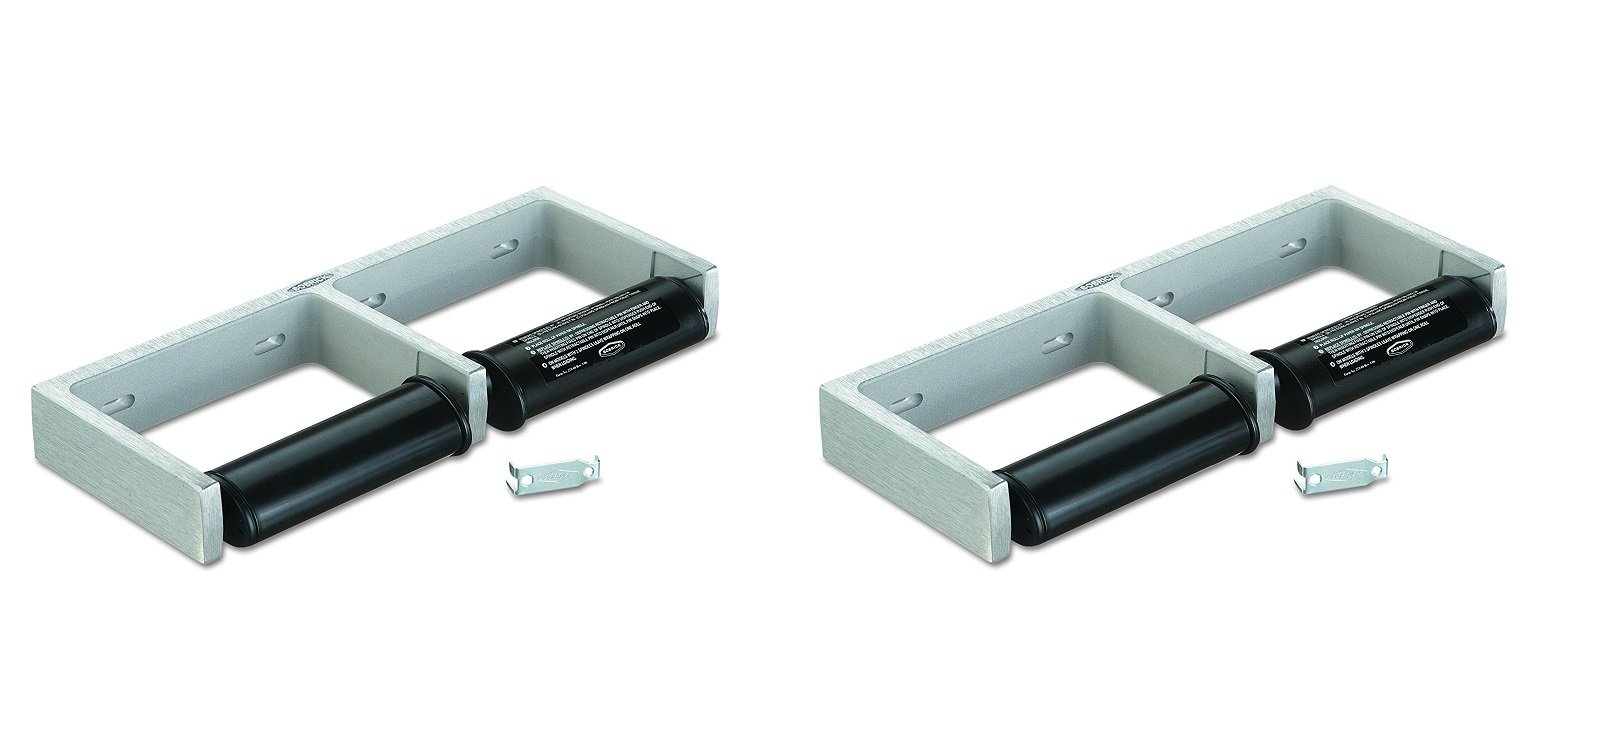 Bobrick 2740 ClassicSeries Toilet Tissue Dispenser for Two Rolls, 12 1/2'' x 4 7/8'' x 1 1/2'' (Pack of 2)